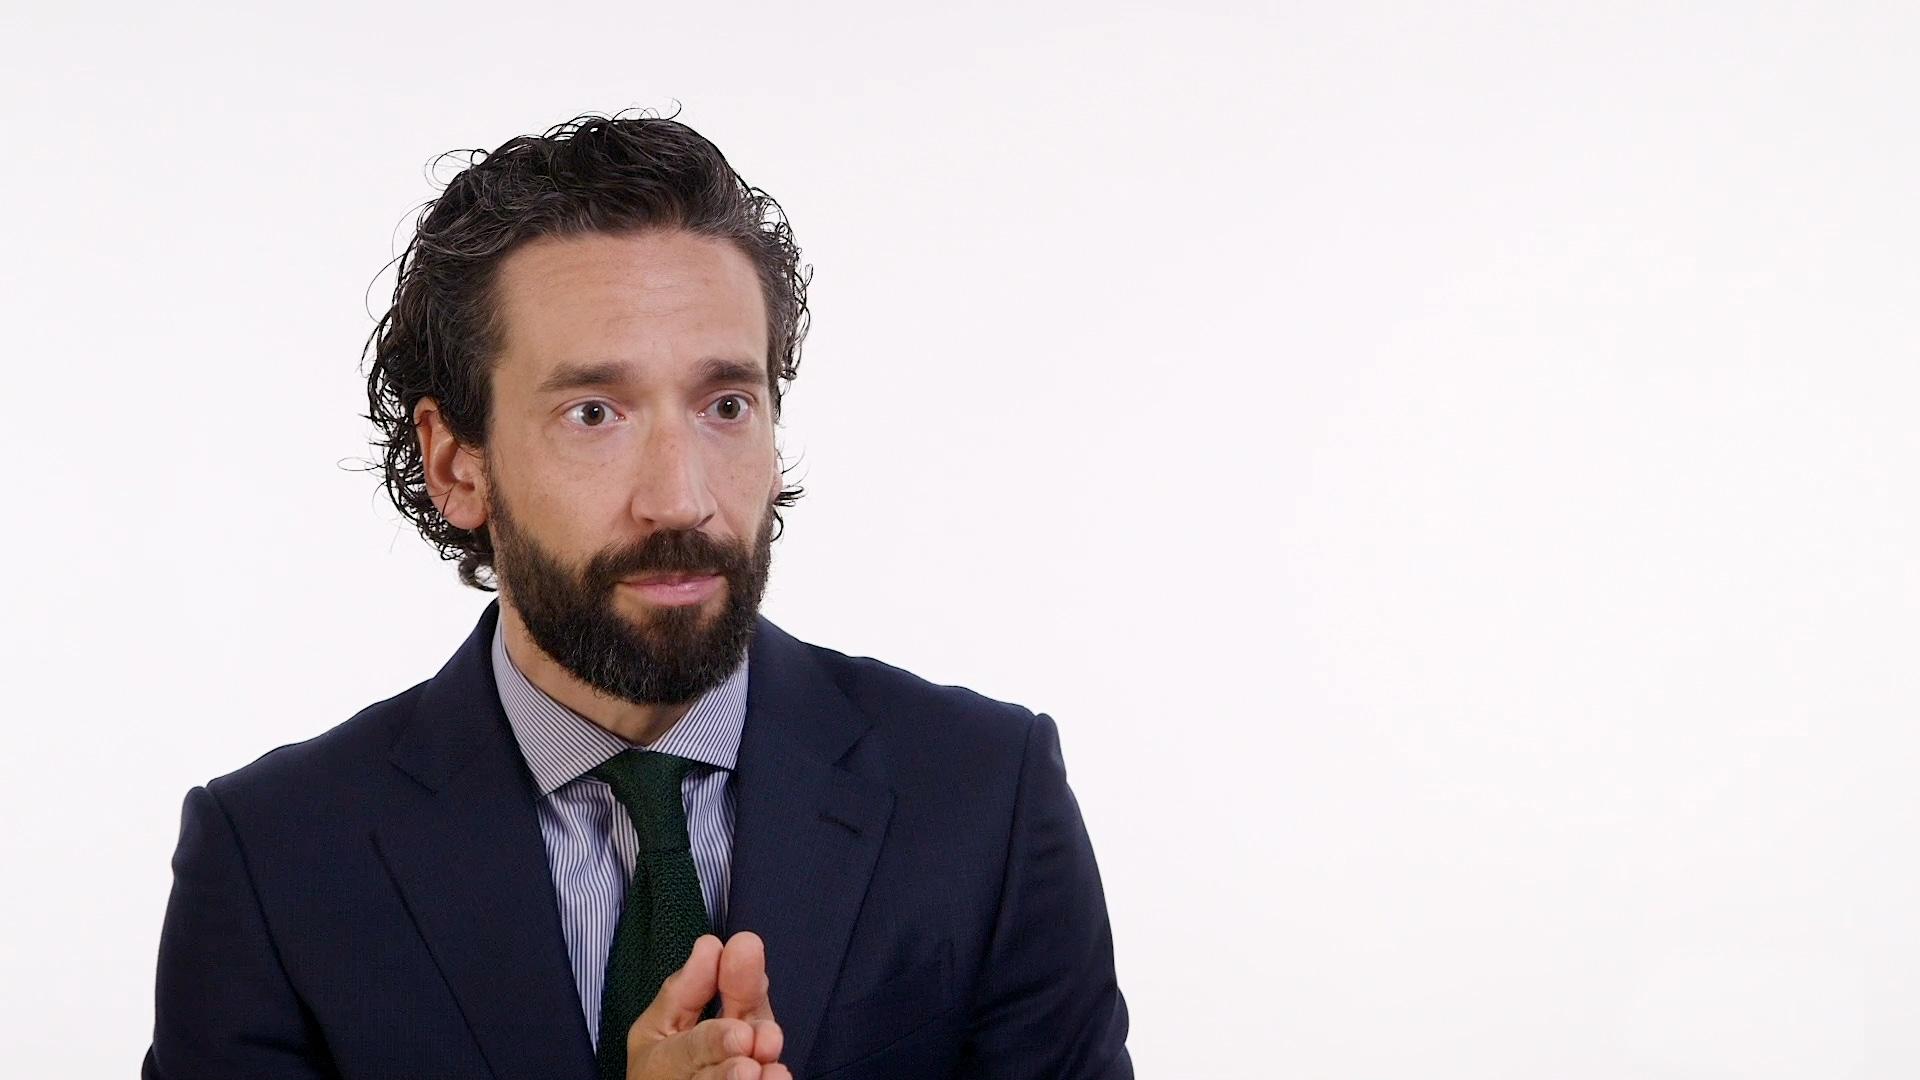 Interventional Cardiologist Ryan Kaple, MD